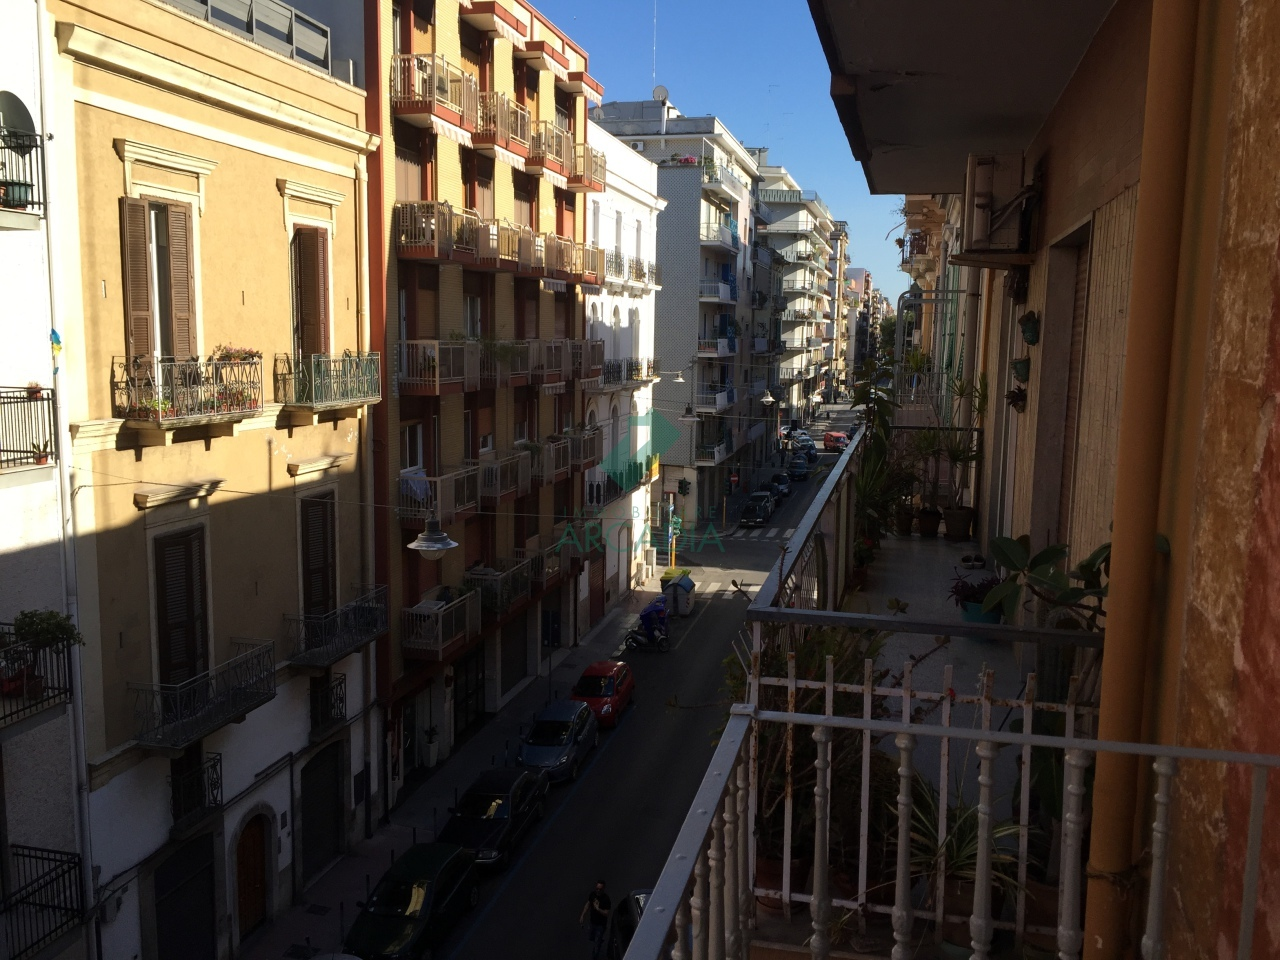 Bilocale Bari Via Bonazzi 36 3